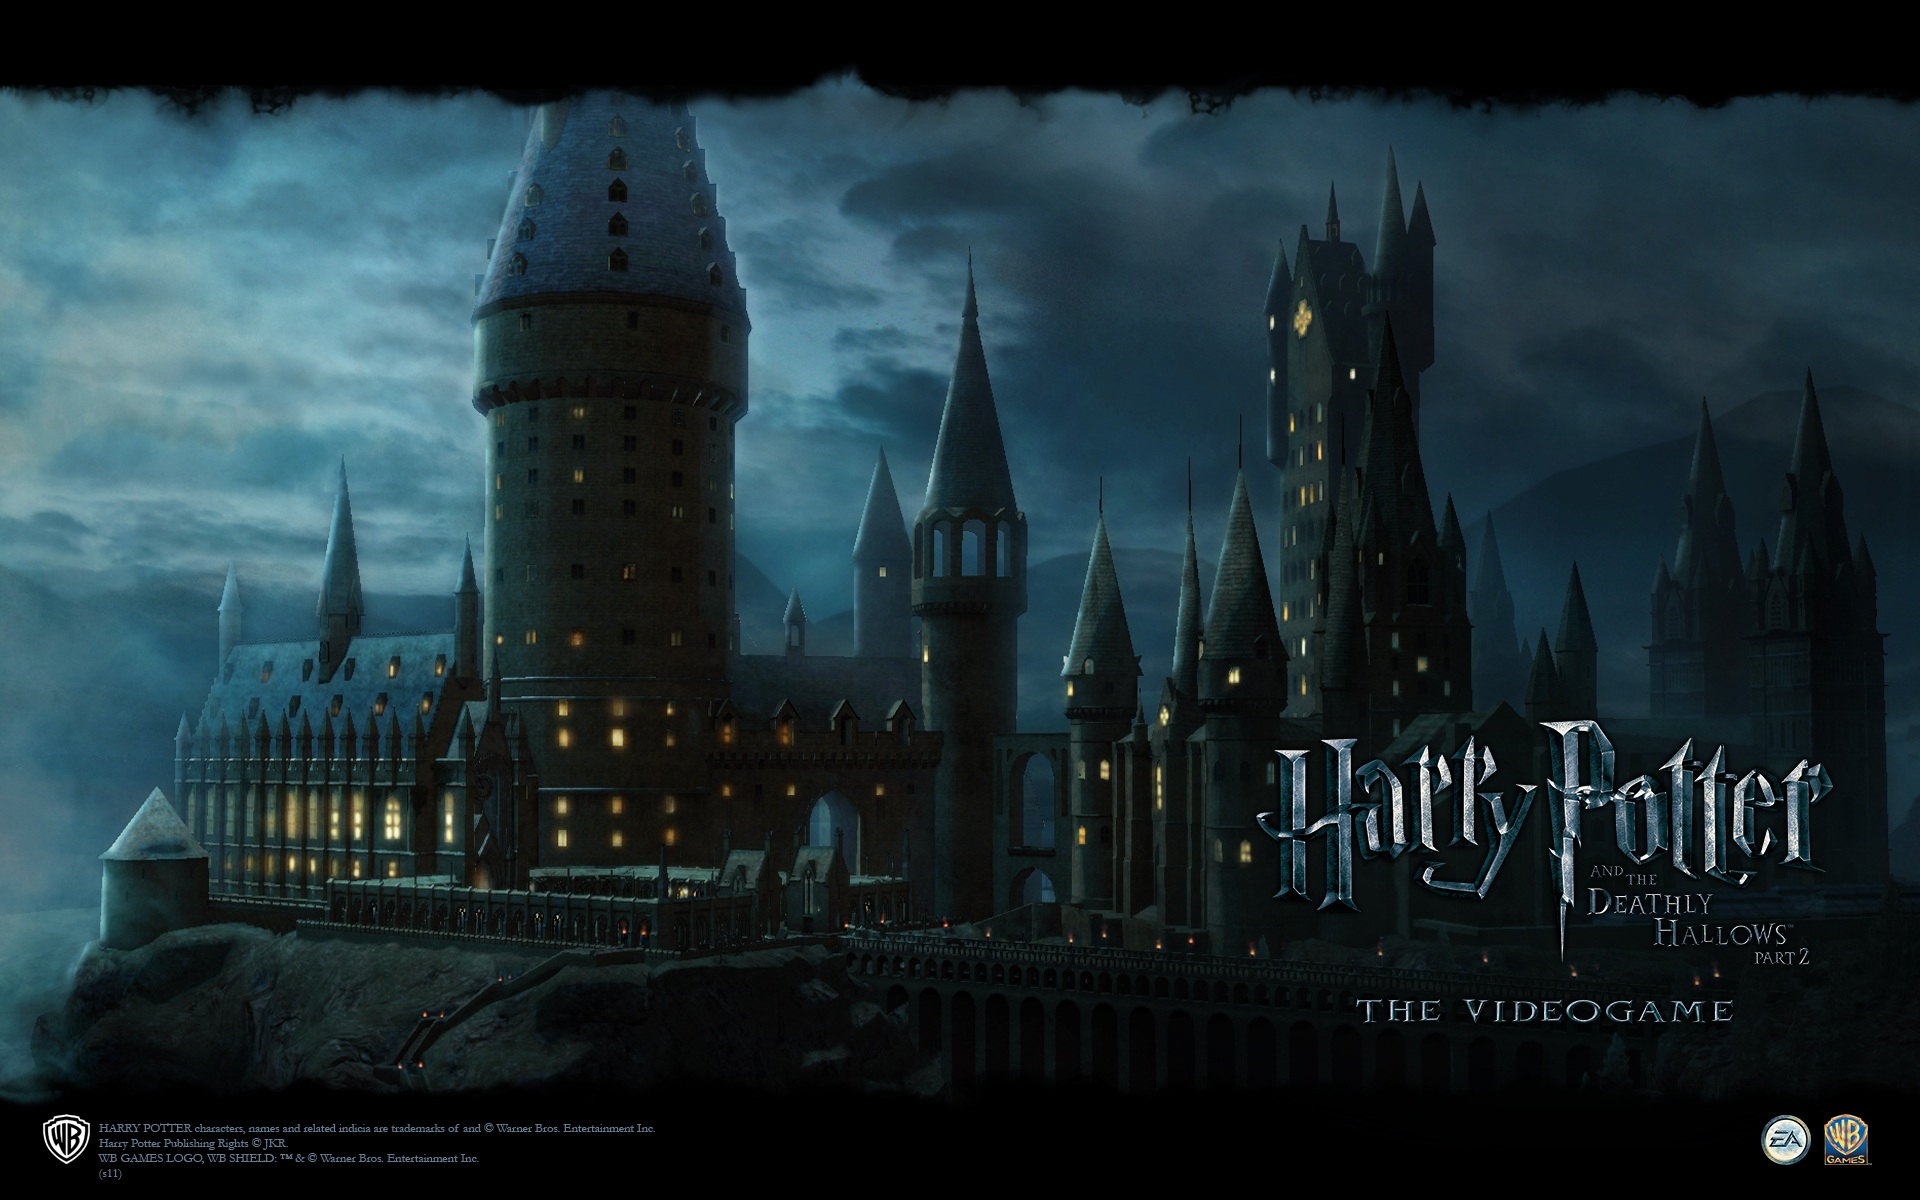 Top Wallpaper Harry Potter Dual Screen - Harry-Potter-Wallpaper-Hd-056  Image_426047.jpg